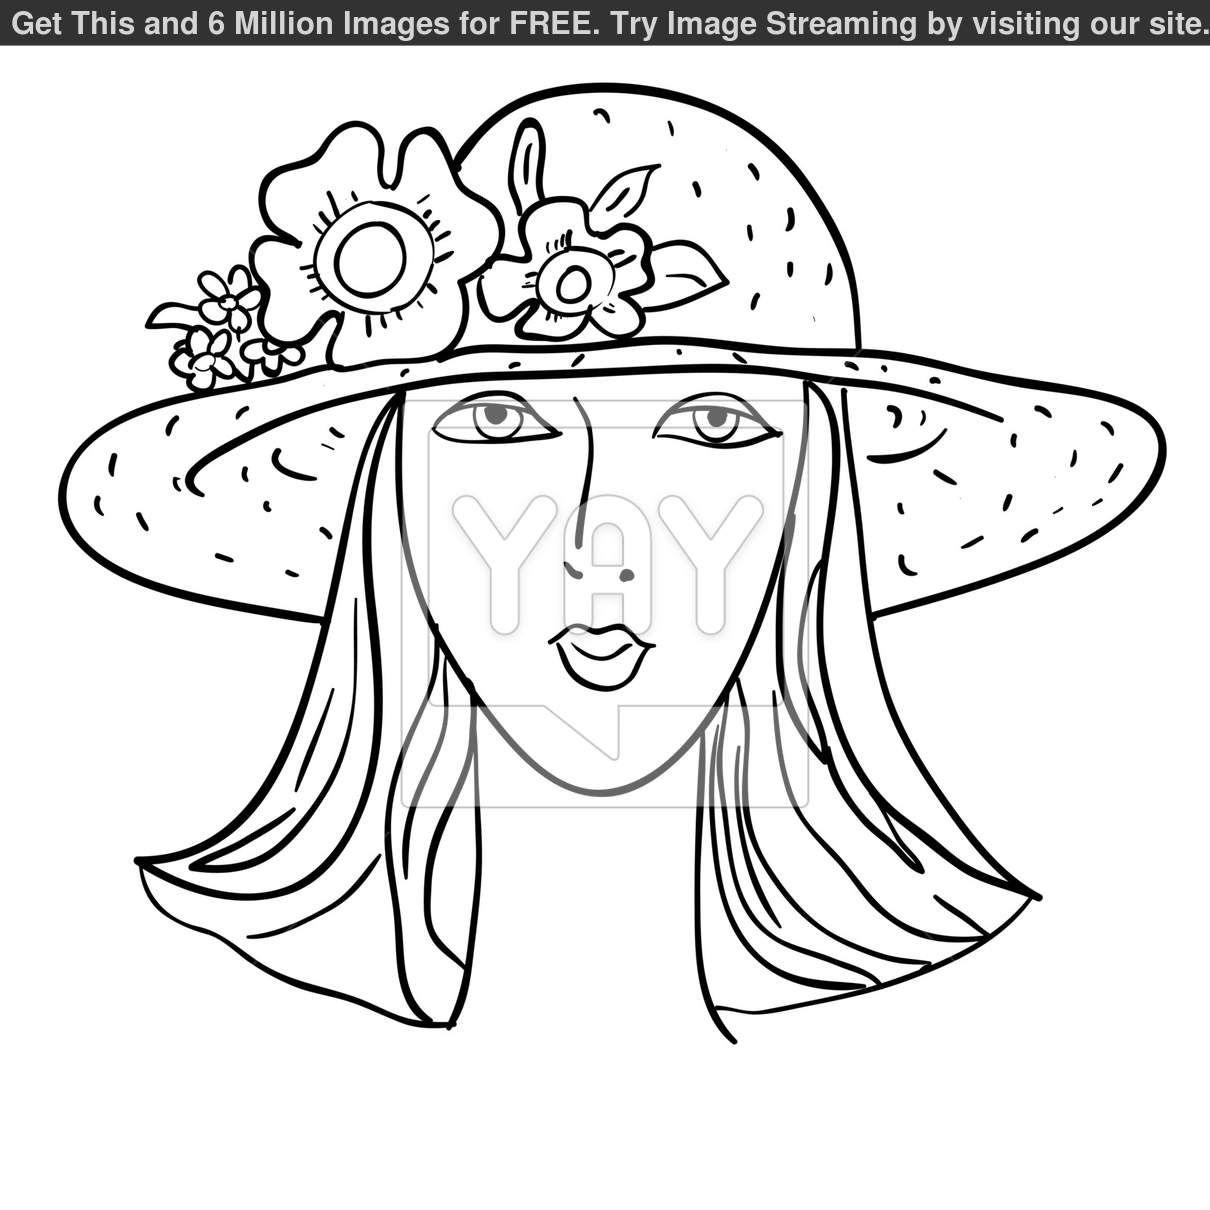 hand-drawn-fashion-model--vector-illustration--woman-s-face-934ff0.jpg (1210×1210)